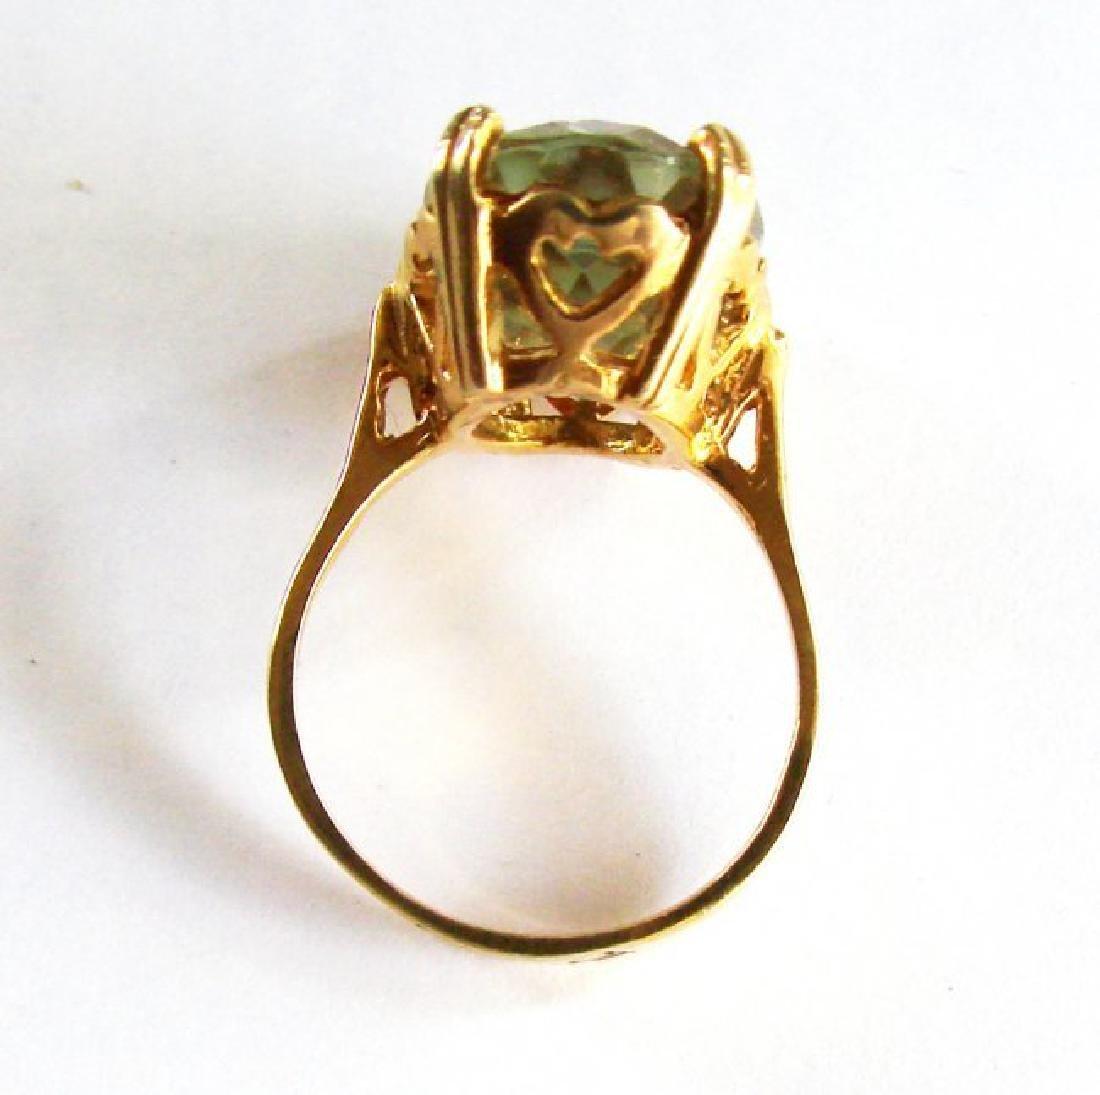 Natural Green Amethyst Ring 11.21Ct 14k Y/g - 4